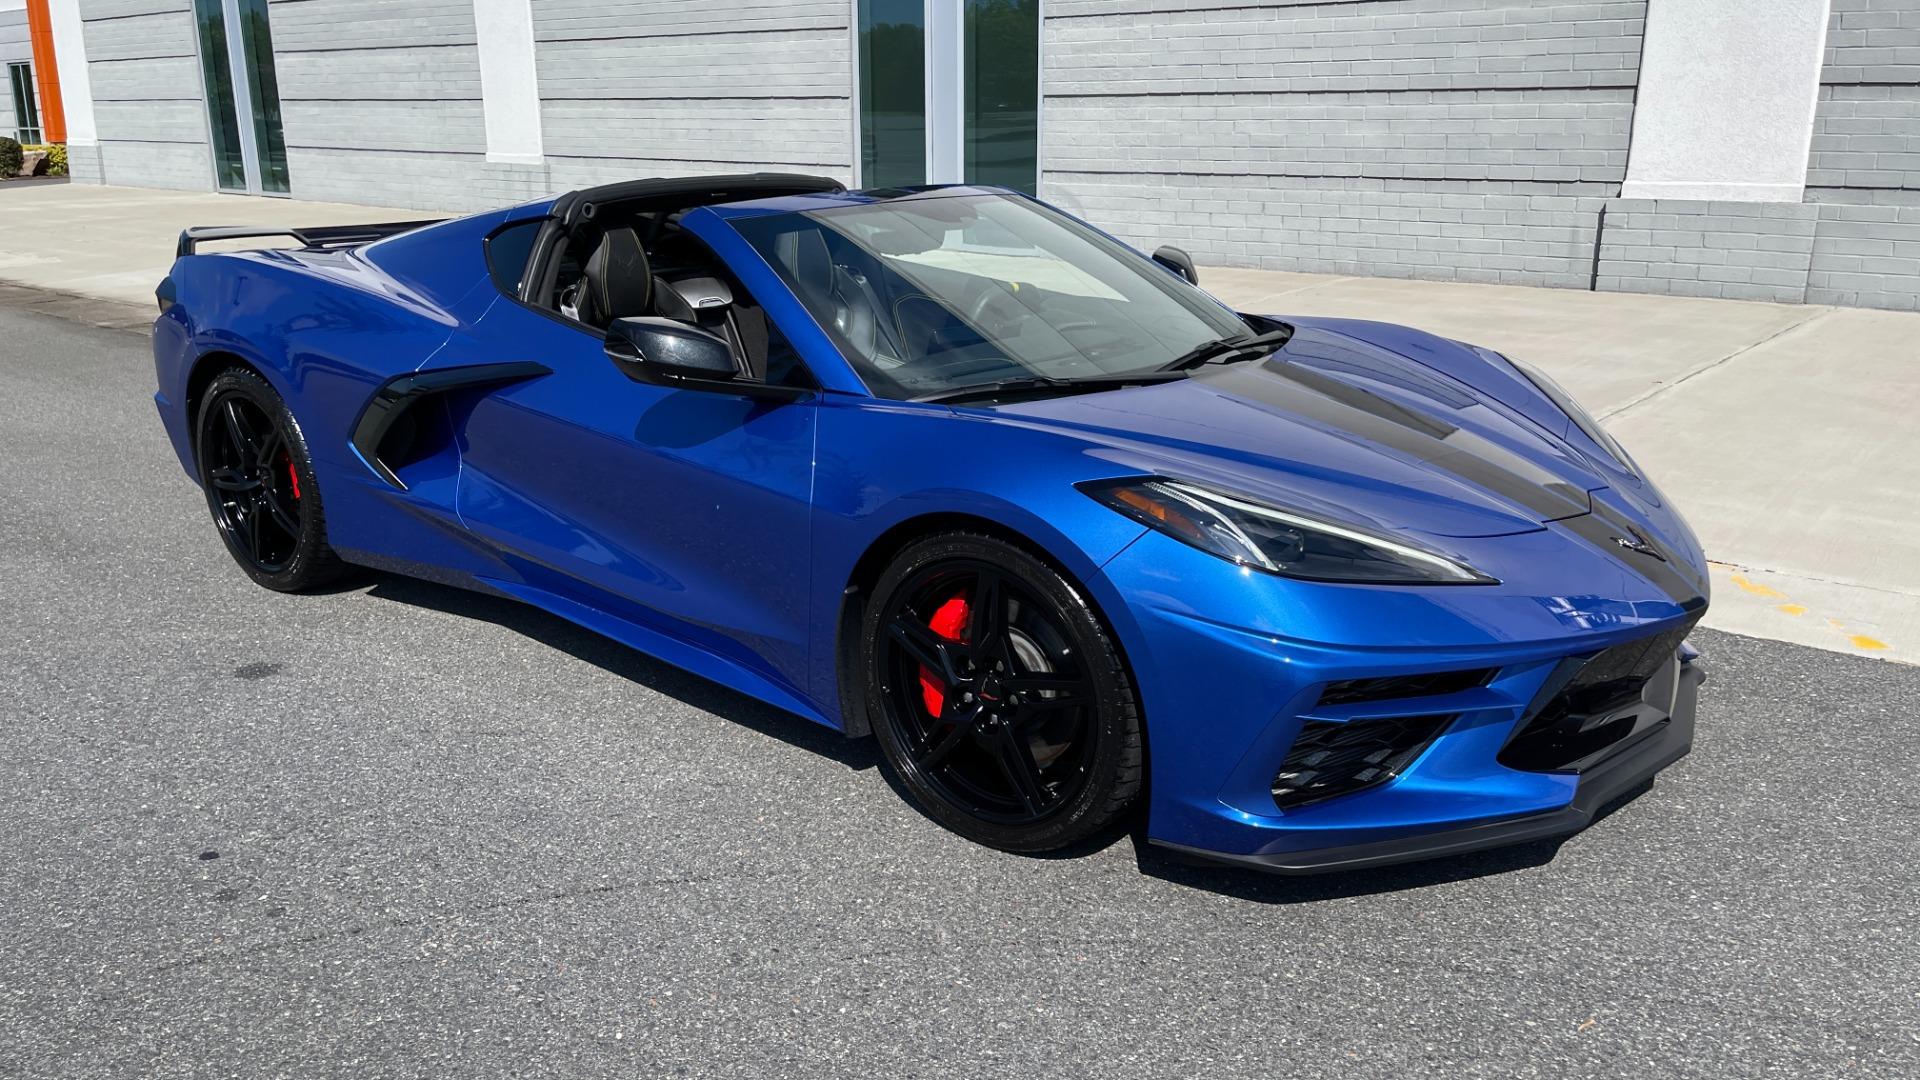 Used 2021 Chevrolet CORVETTE STINGRAY 3LT COUPE / 8-SPD / PERF PKG / NAV / BOSE / REARVIEW for sale $110,995 at Formula Imports in Charlotte NC 28227 48